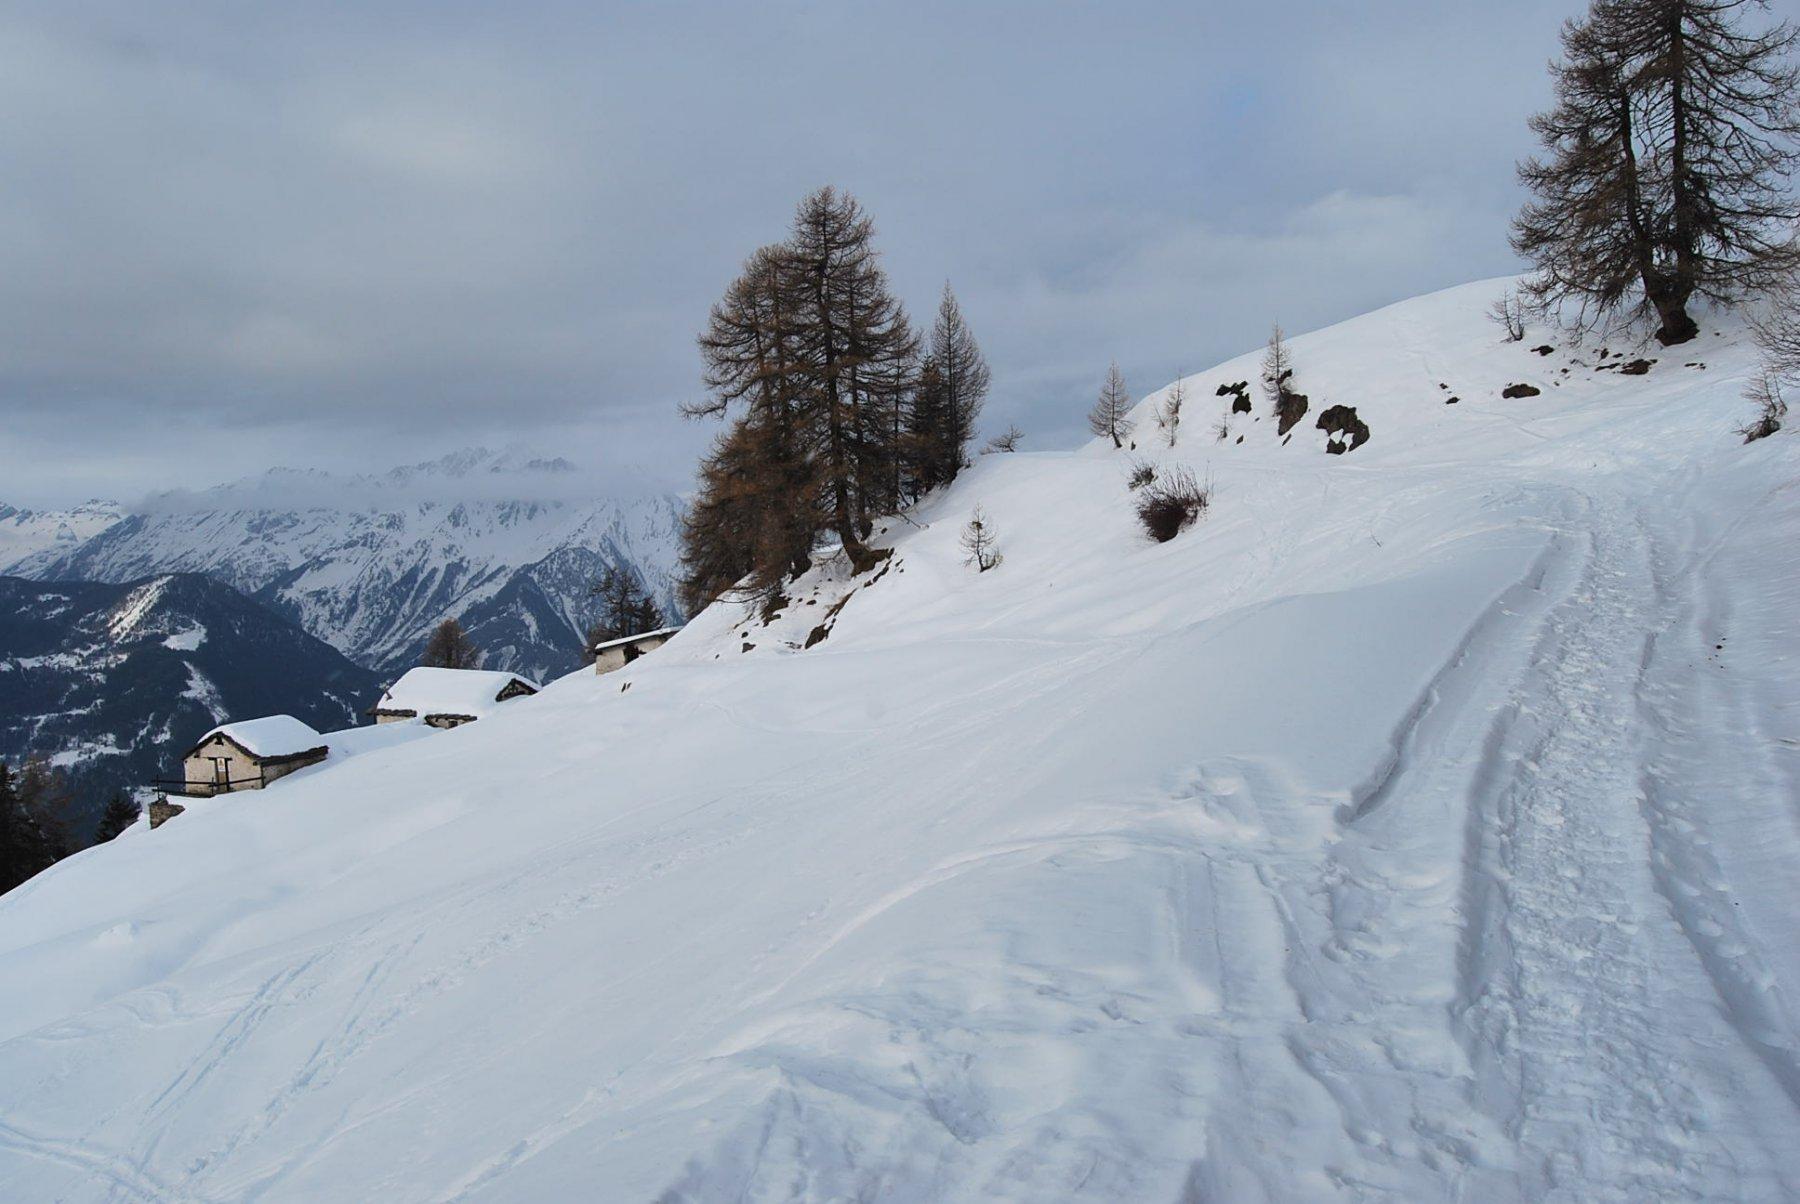 Ultima curva prima di Les Ors. In basso gli alpeggi di Plan Bellard